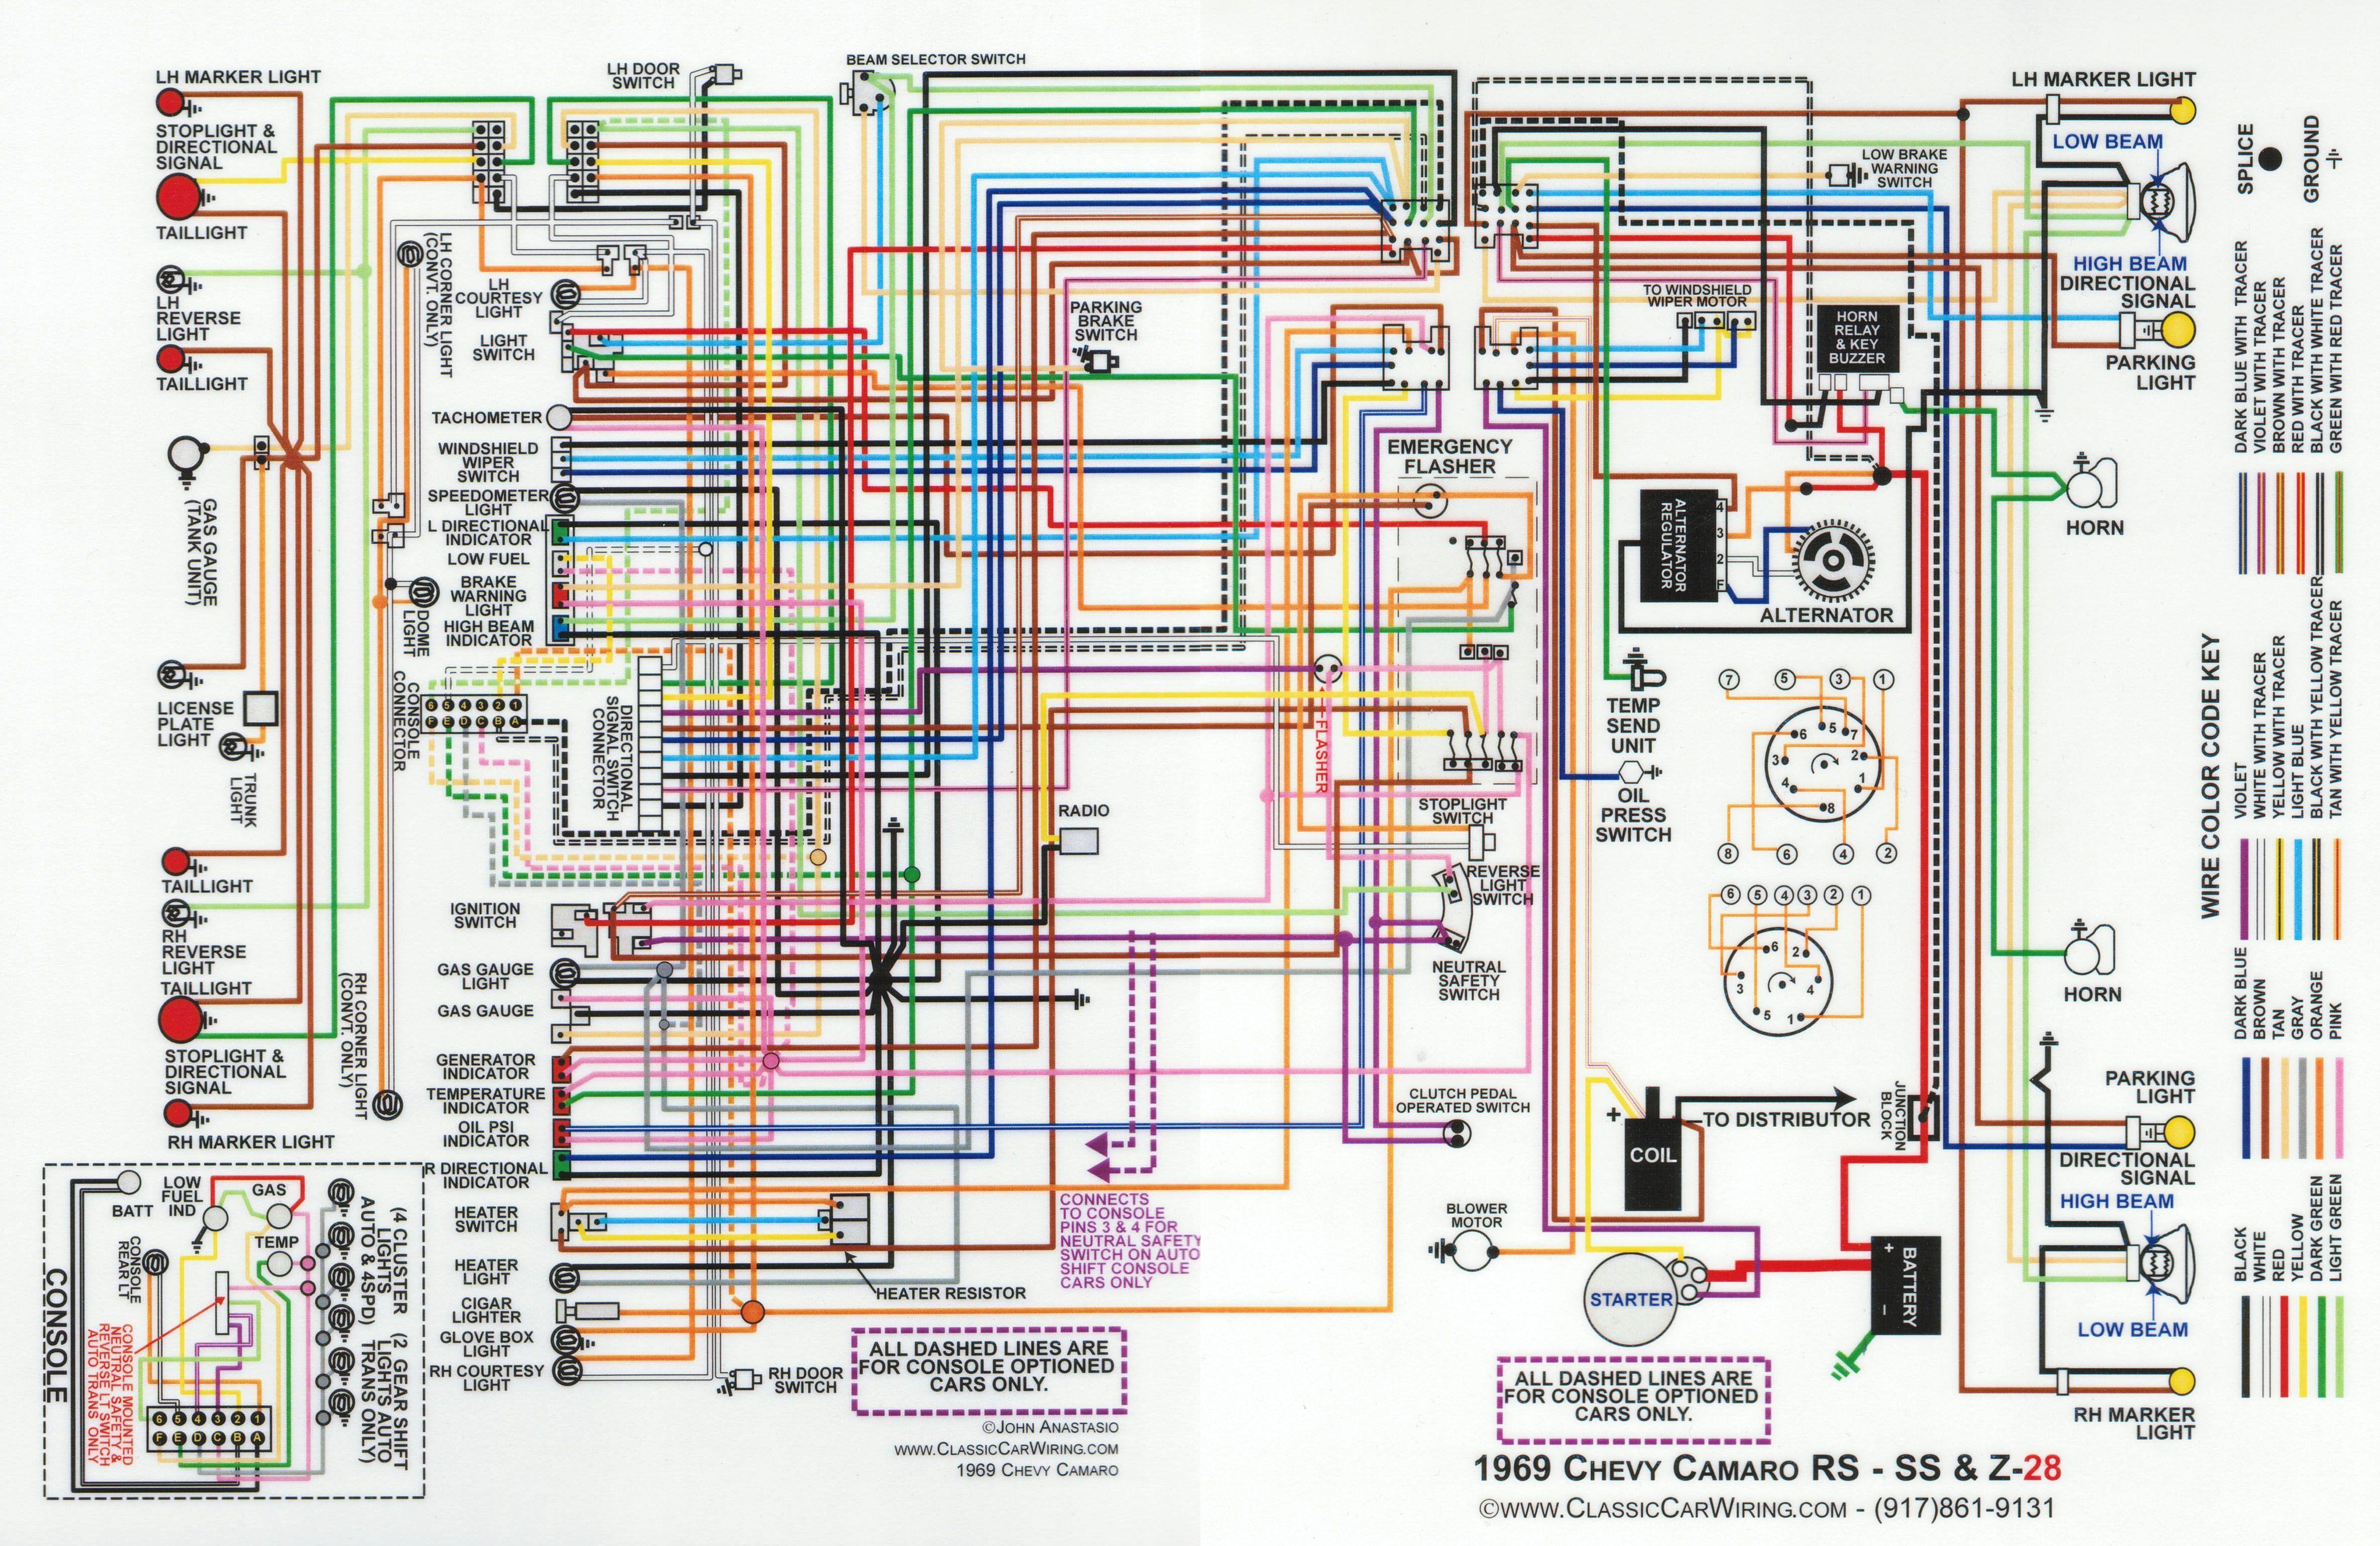 Diagram 1969 Camaro Wiring Diagram Color Full Version Hd Quality Diagram Color Wiringgame Pizzagege Fr